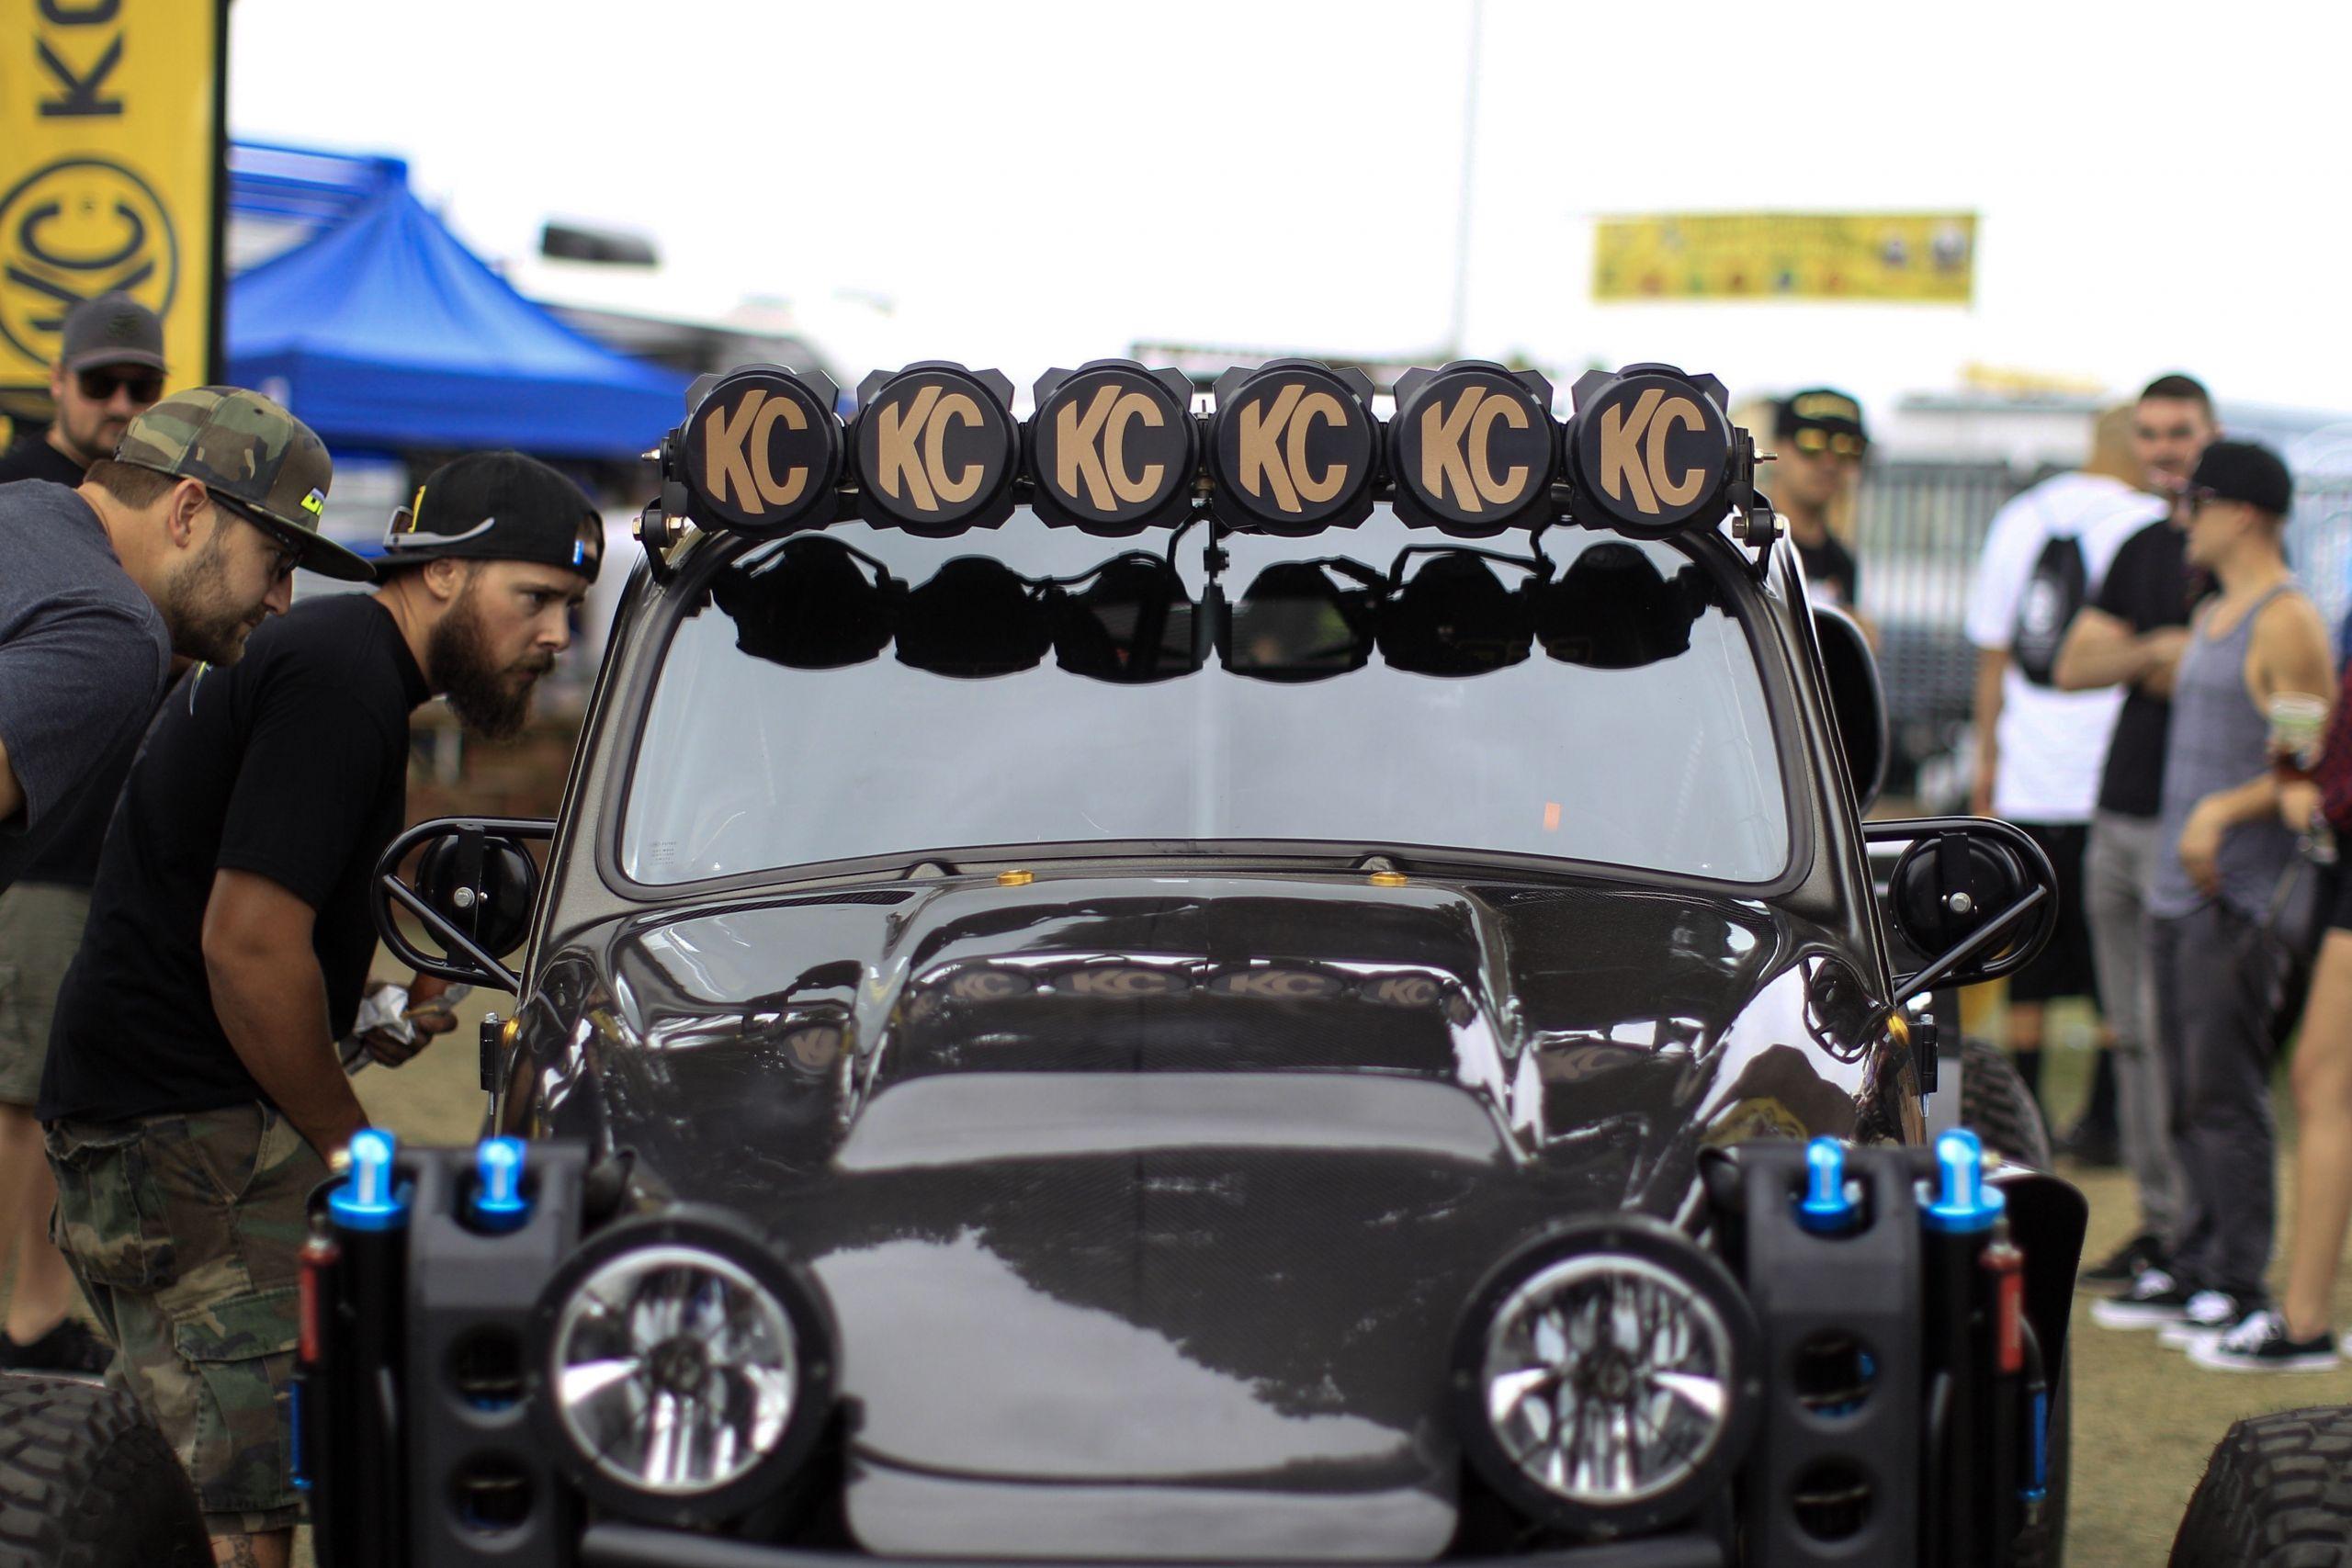 Custom Volkswagen Bug Off Road Build - Extreme Performance - Image #01